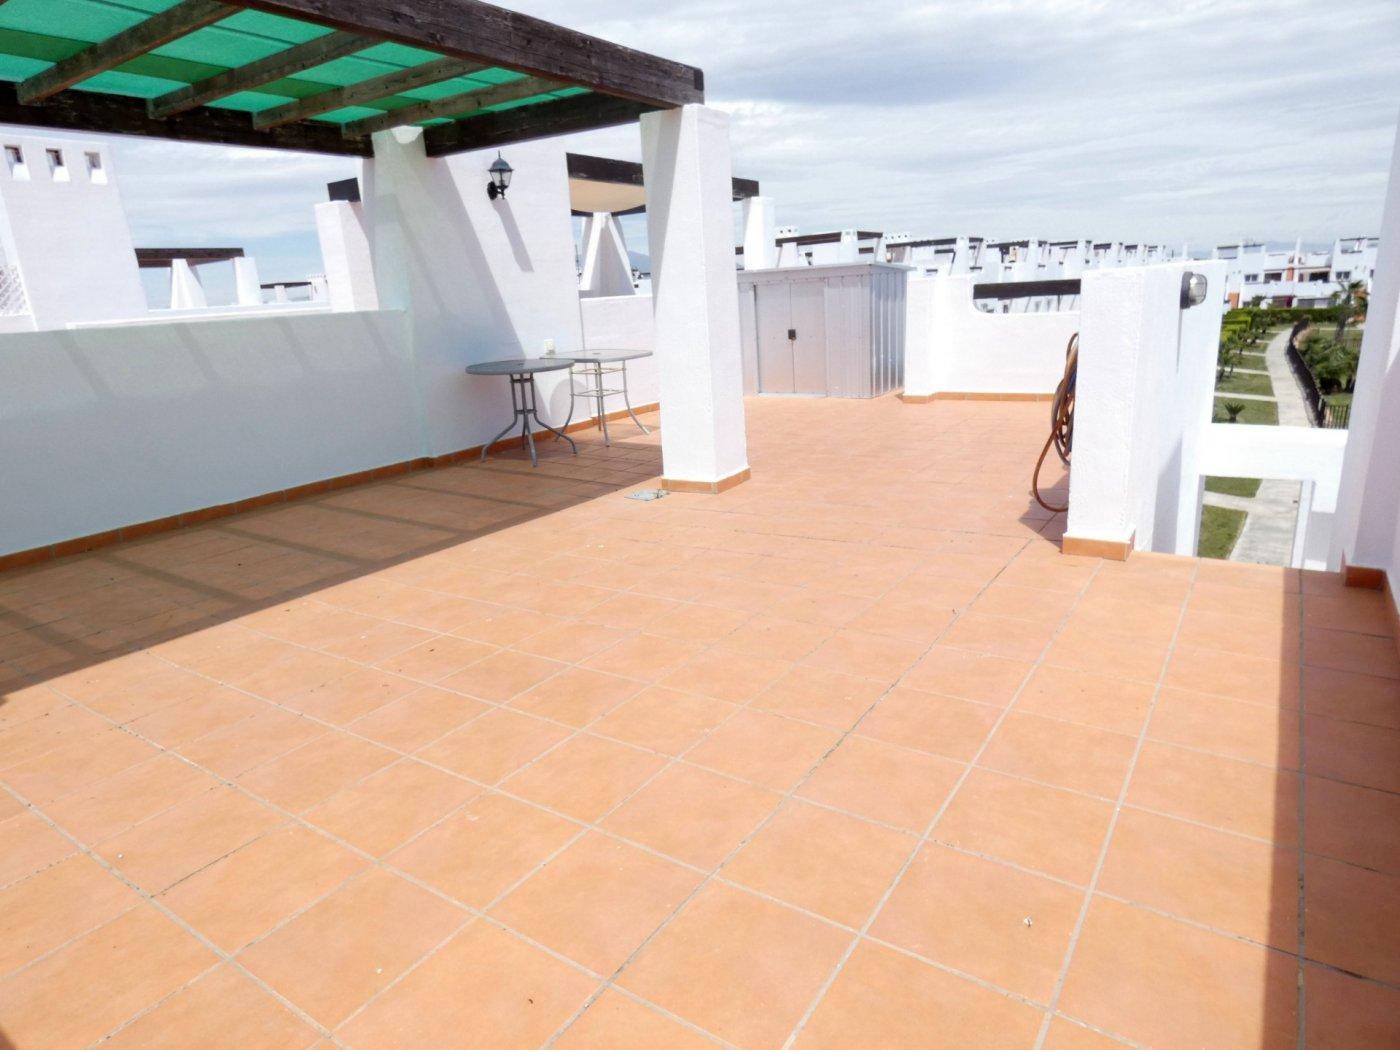 Gallery Image 14 of Key-Ready 2 Bedroom Apartment Overlooking the Citrus Groves in Jardin 10, Condado de Alhama